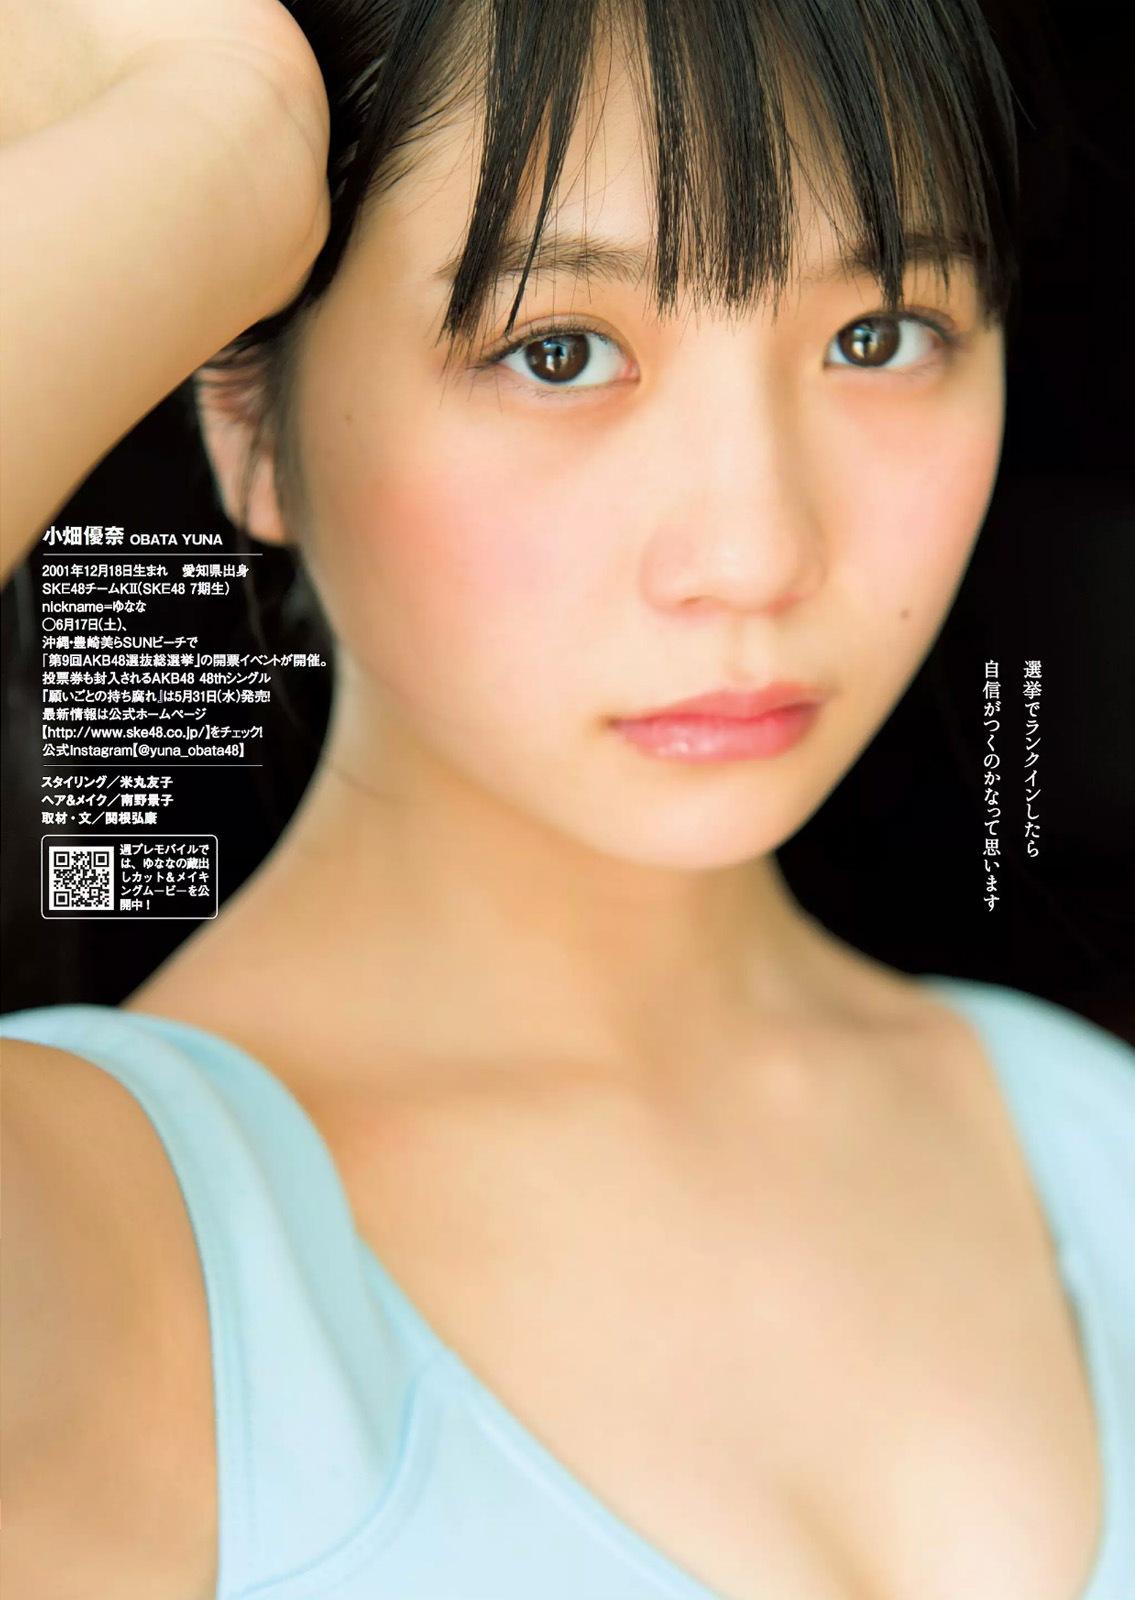 Obata Yuna 小畑優奈 SKE48, Weekly Playboy 2017.06.05 No.23 (週刊プレイボーイ 2017年23号)